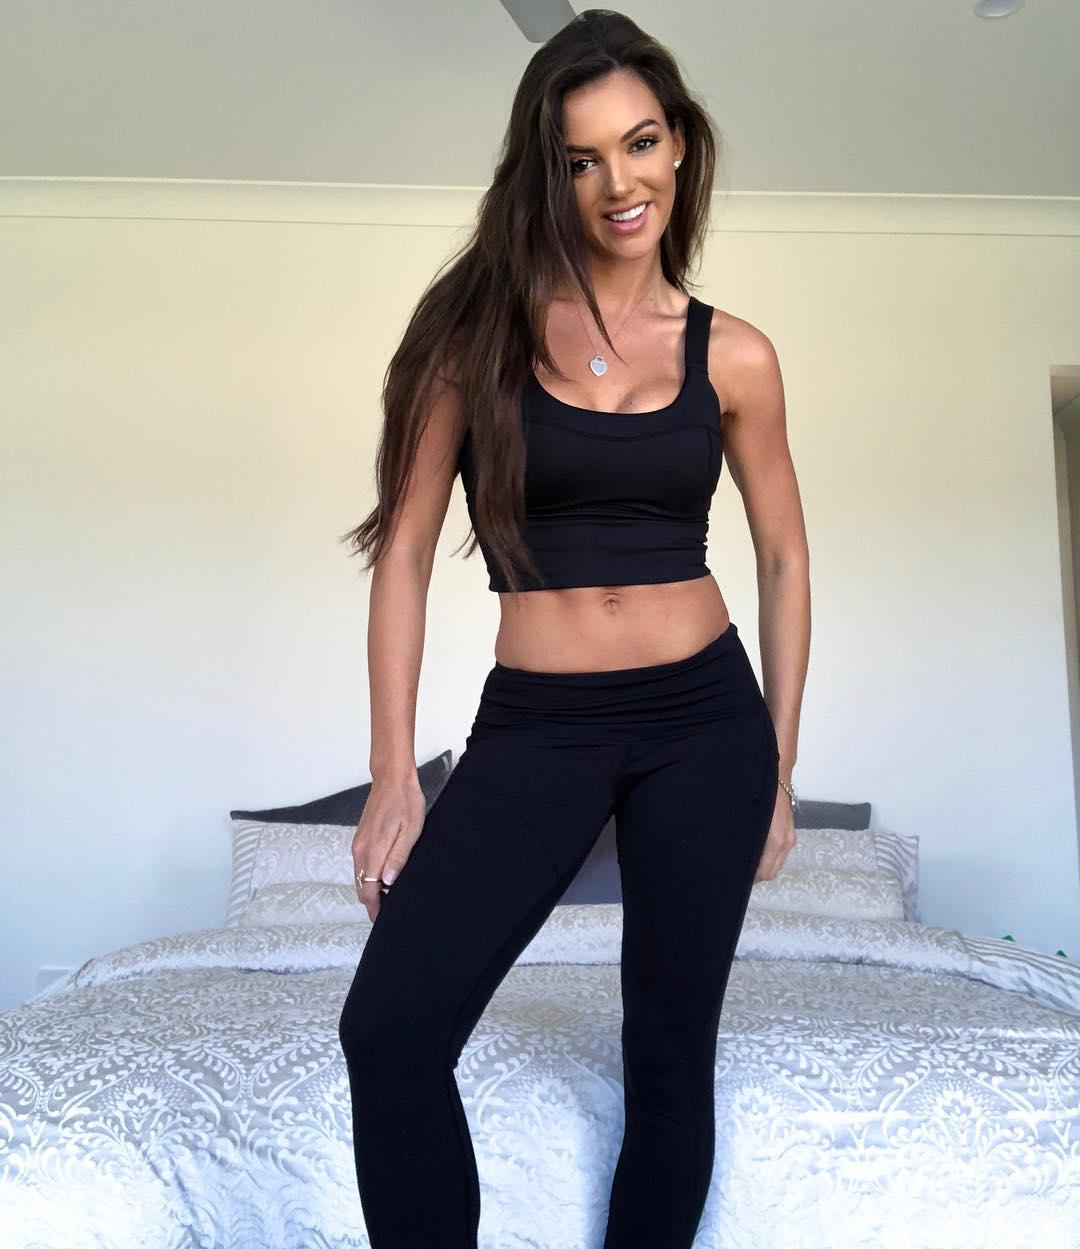 Amanda-Blanks-Wallpapers-Insta-Fit-Girls-6